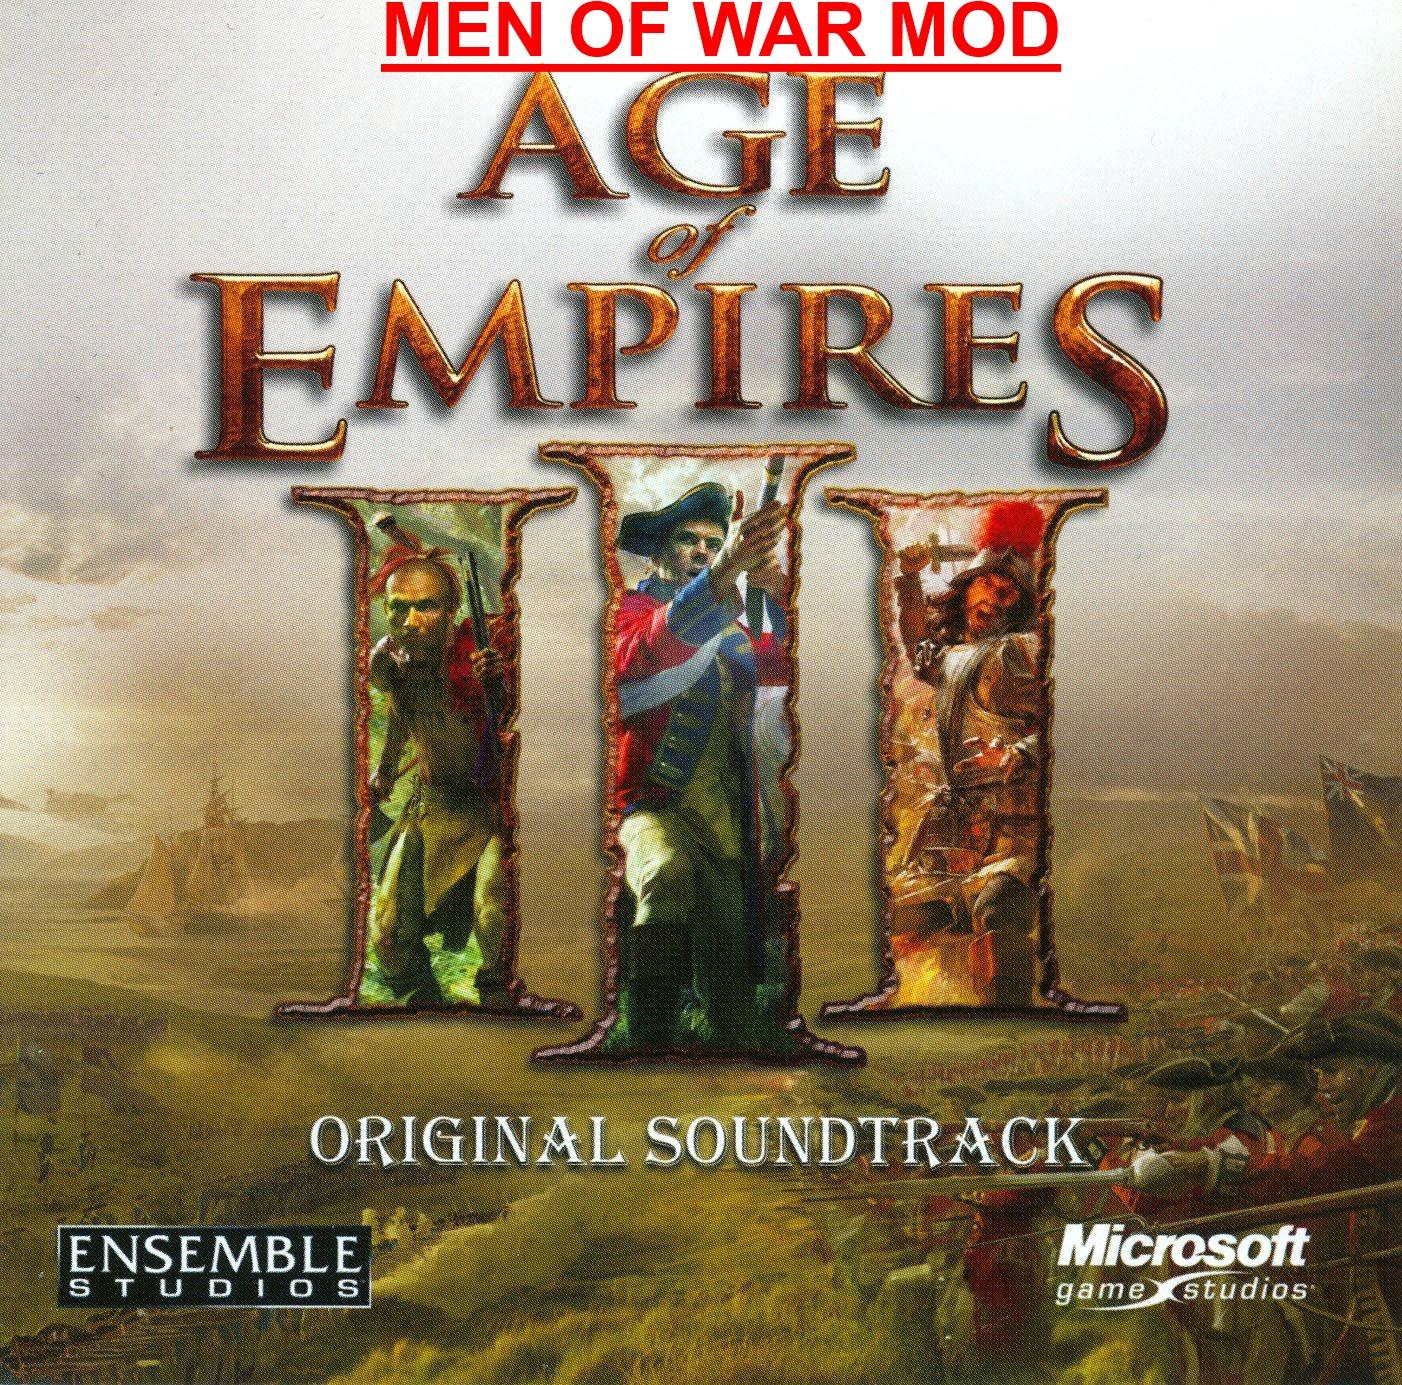 تحميل لعبة استراتجية Age of Empires III كاملة رابط 1 مباشر  Big-age-of-empires-iii-mod